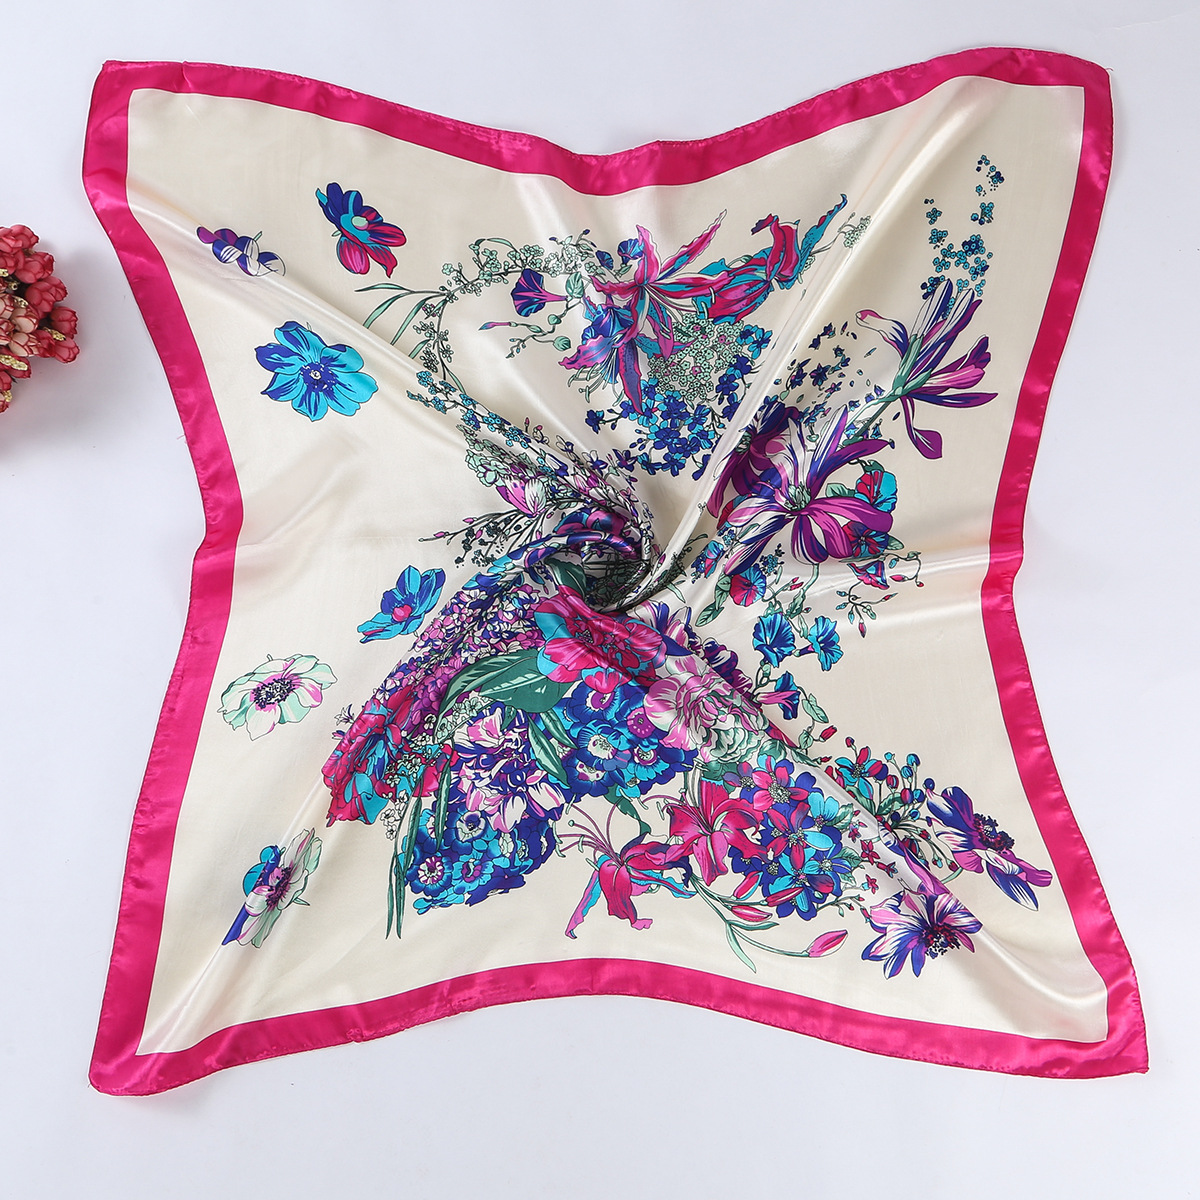 DANKEYISI 2018 New Spring Women Scarf Female Square Silk Scraf Shawl Ladies Scarves hijab Beach Pashmina Shawl Foulard Scarf